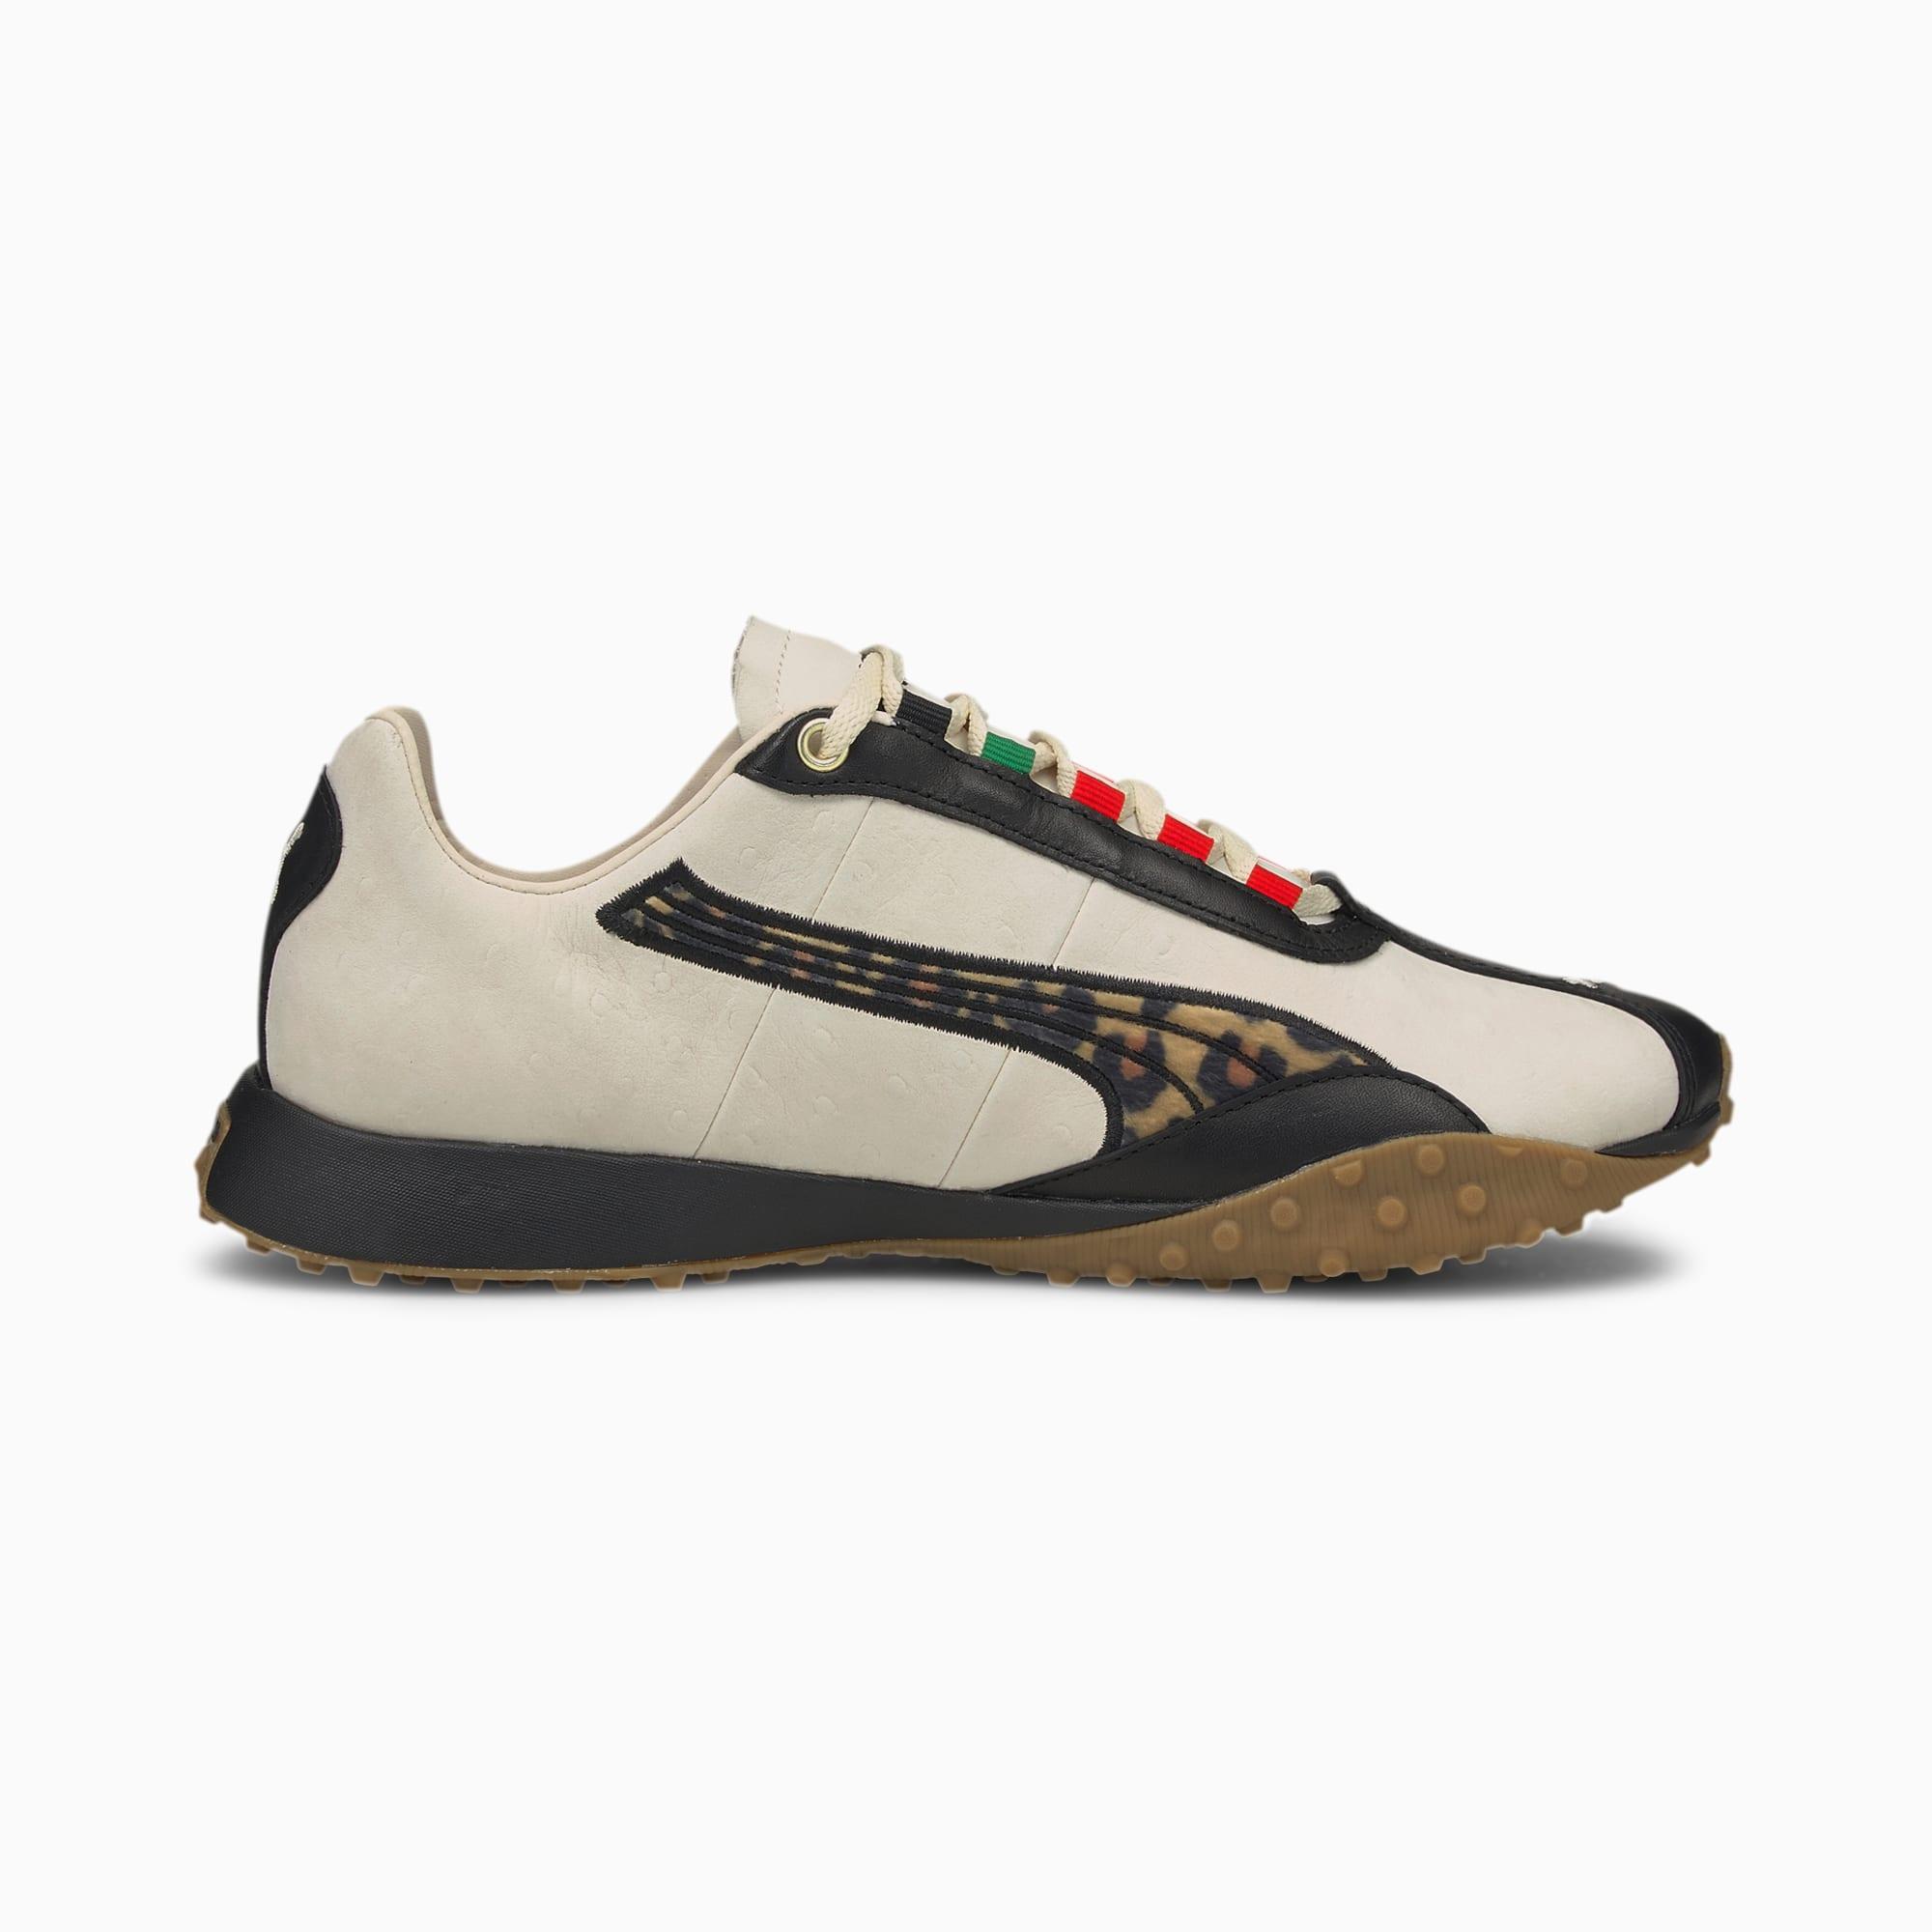 H.ST.20 SAVANAH Running Shoes | Tapioca Puma Blk Hgh Rsk Rd